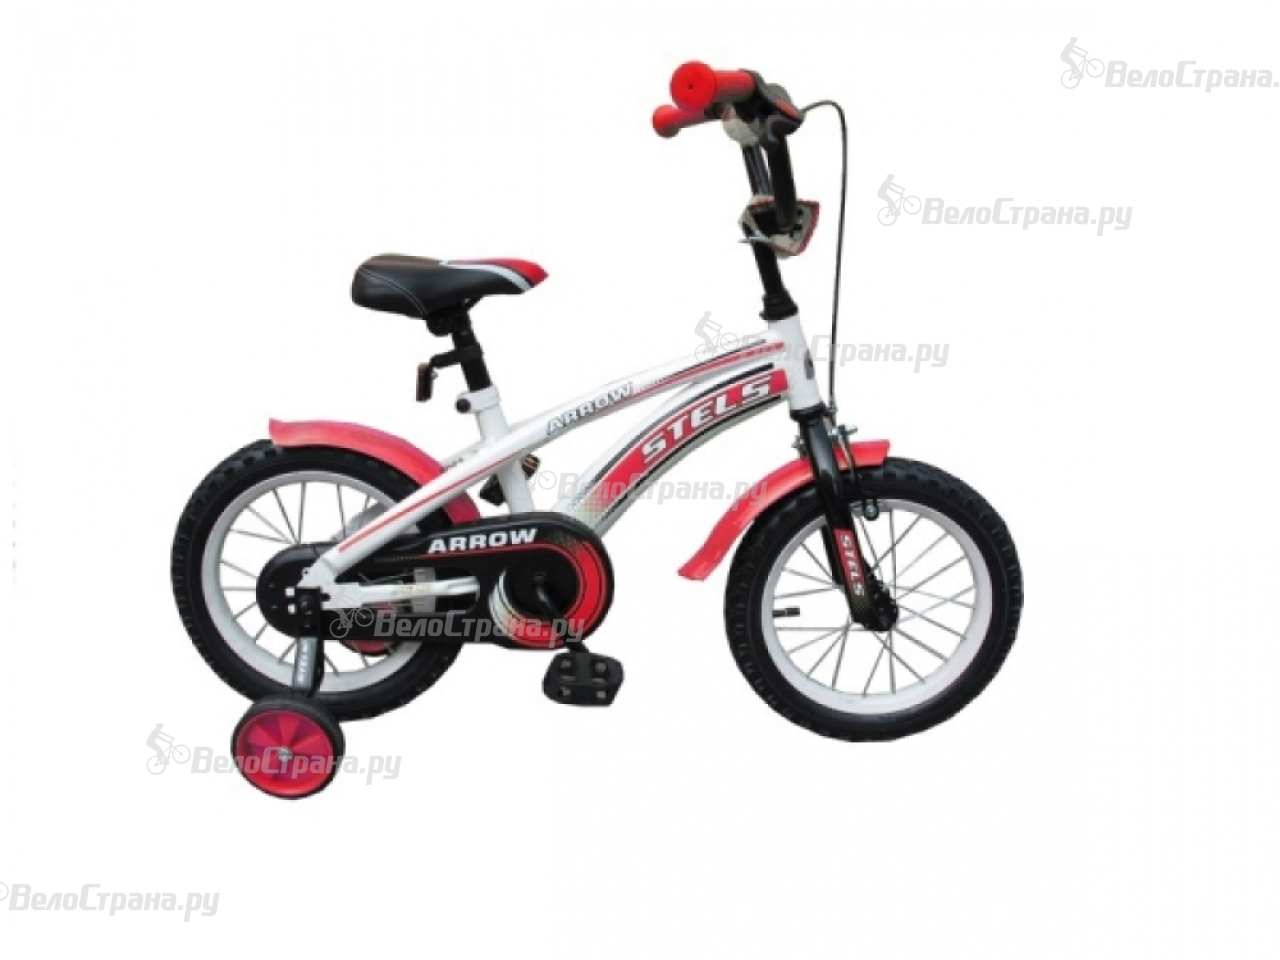 Велосипед Stels Arrow 14 (2013)